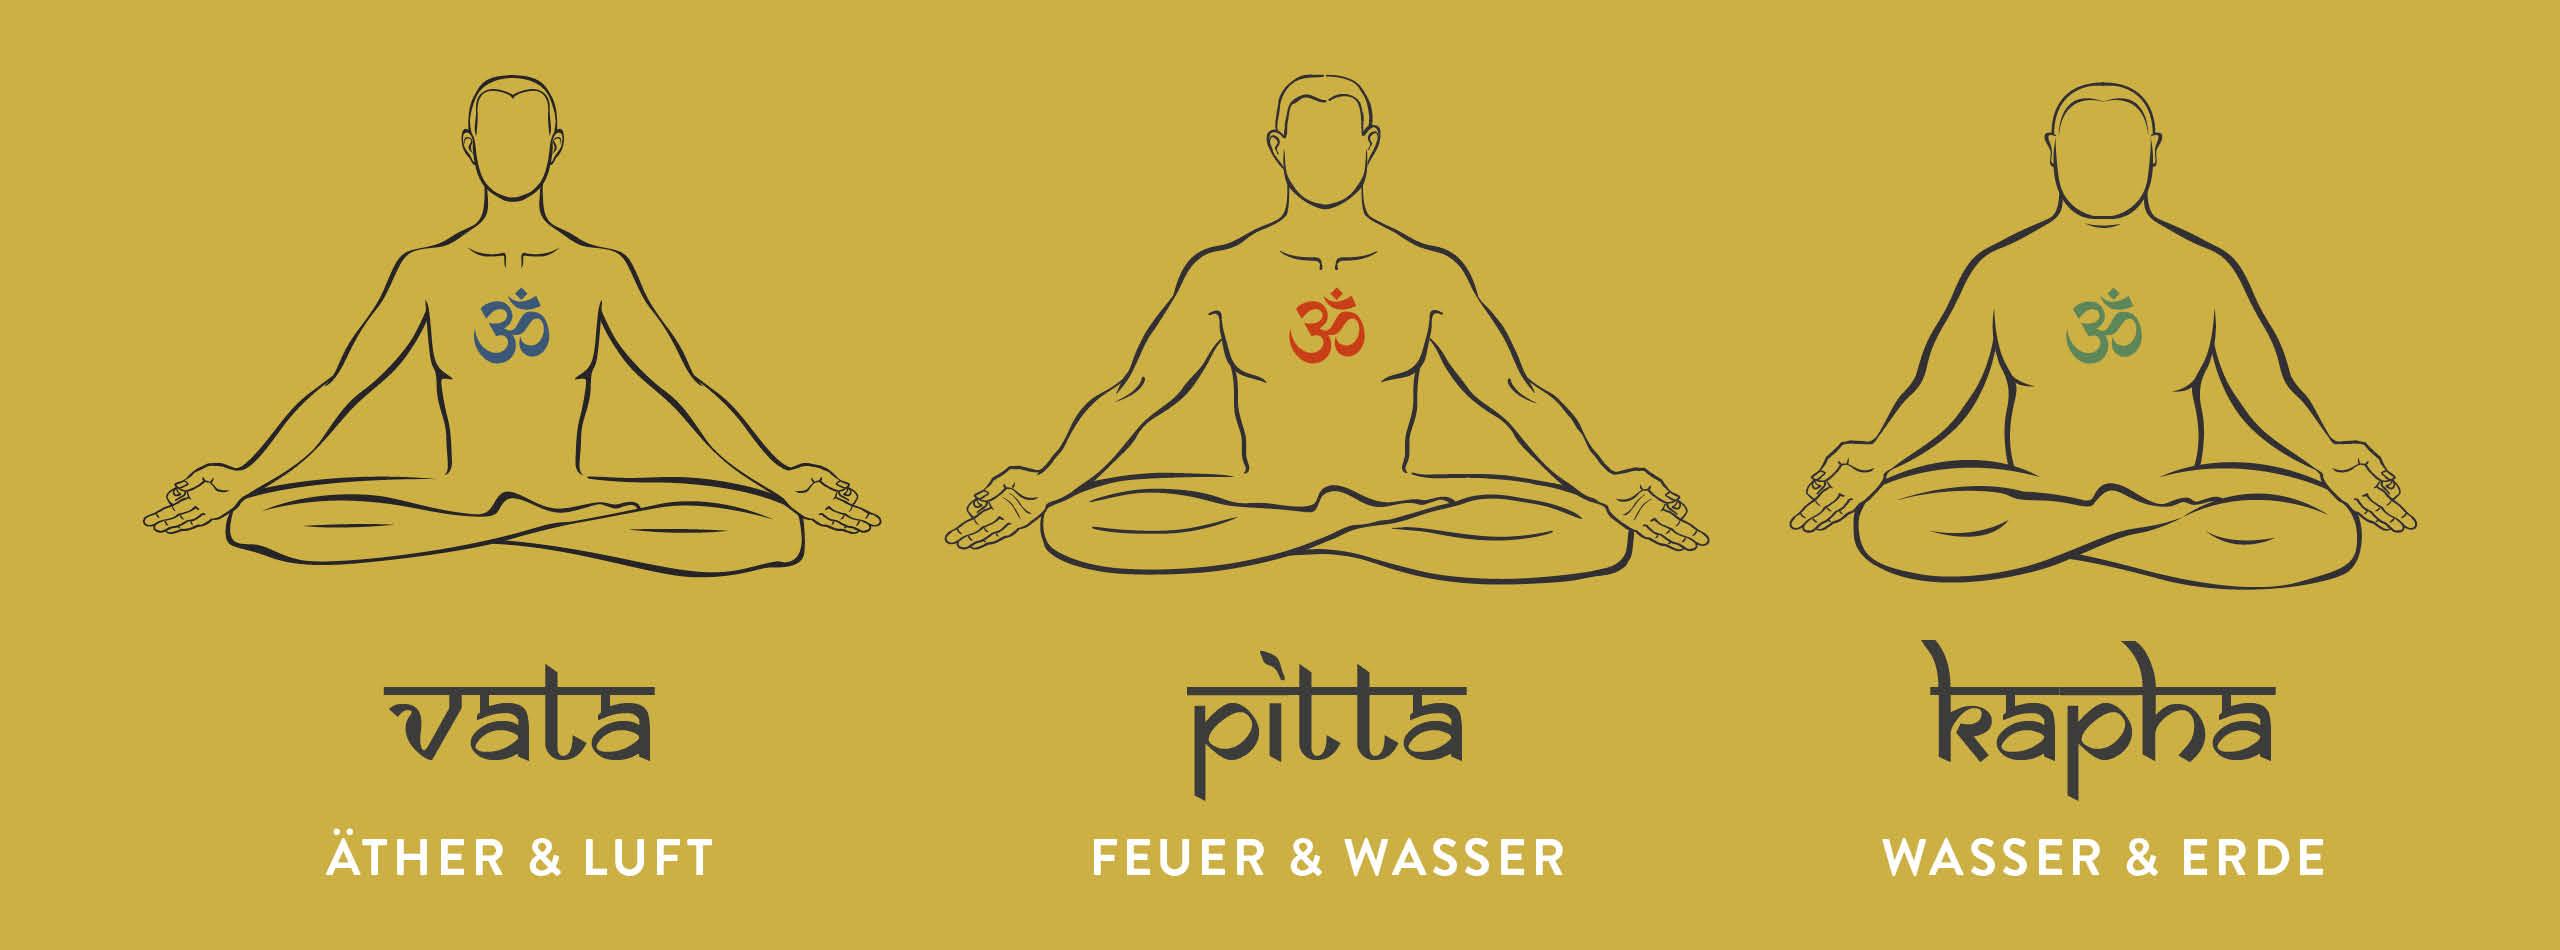 Vata – Pitta – Kapha Konstitutionstypen in Balance bringen